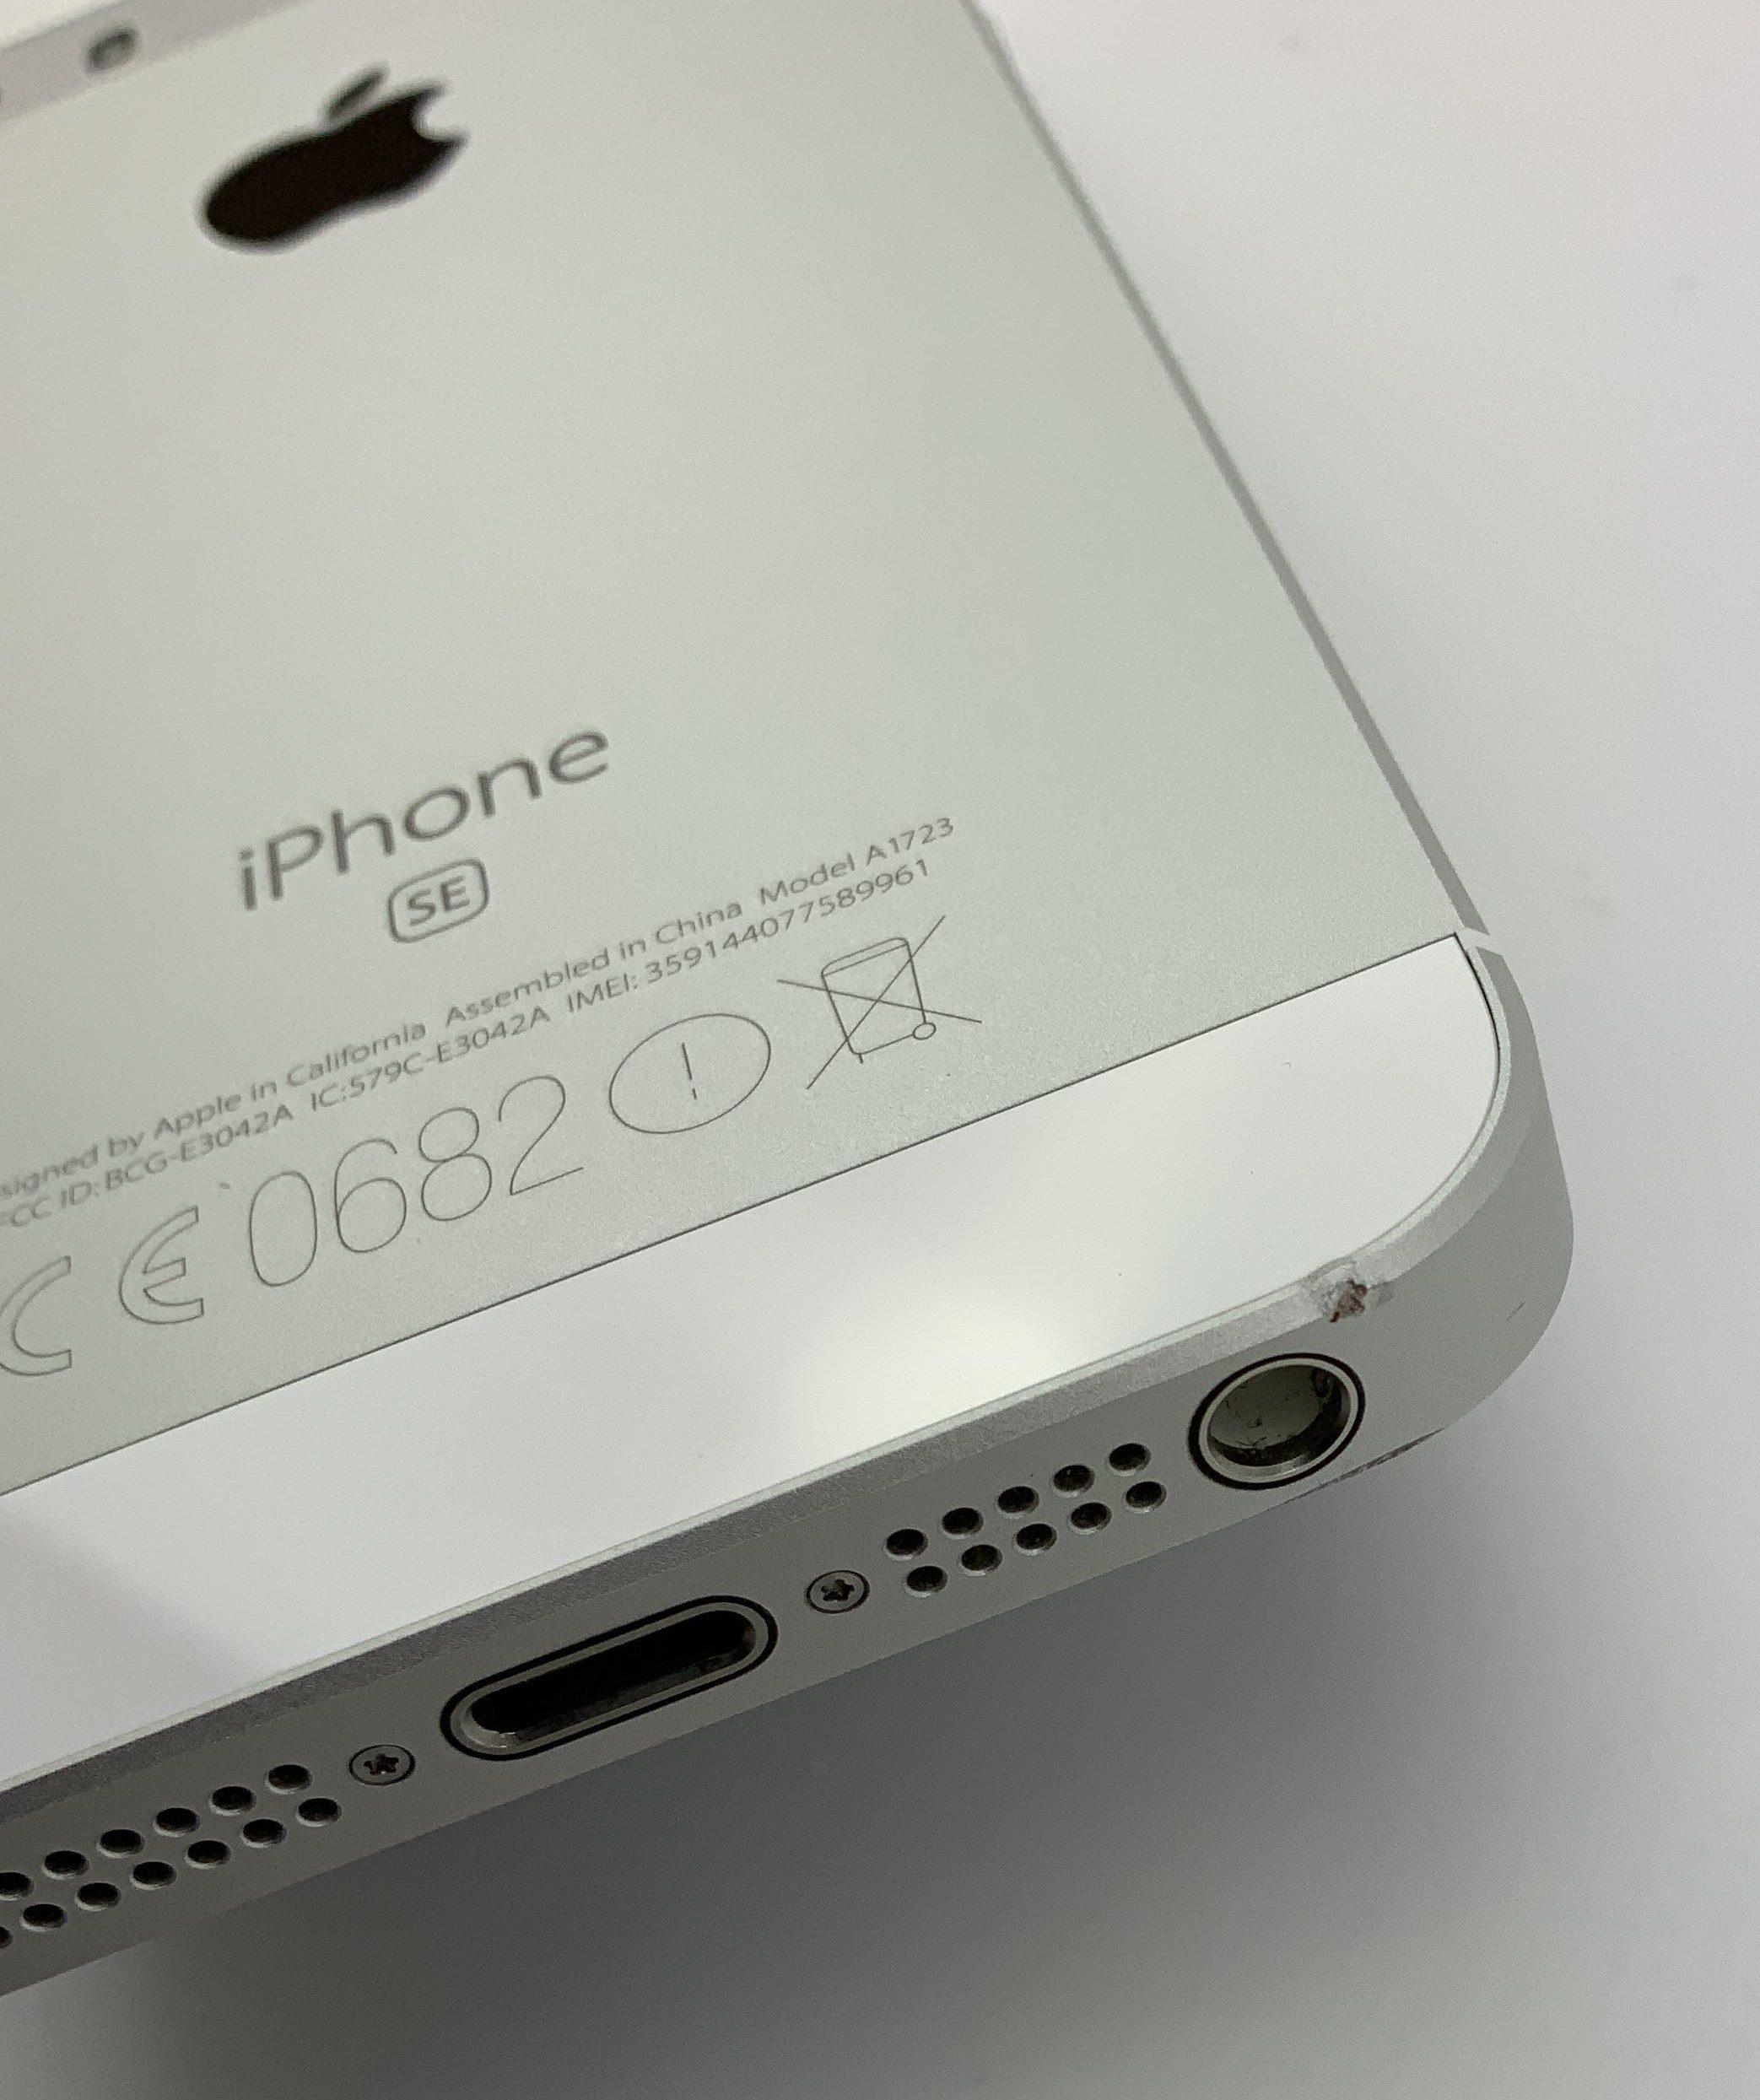 iPhone SE 16GB, 16GB, Silver, Kuva 3